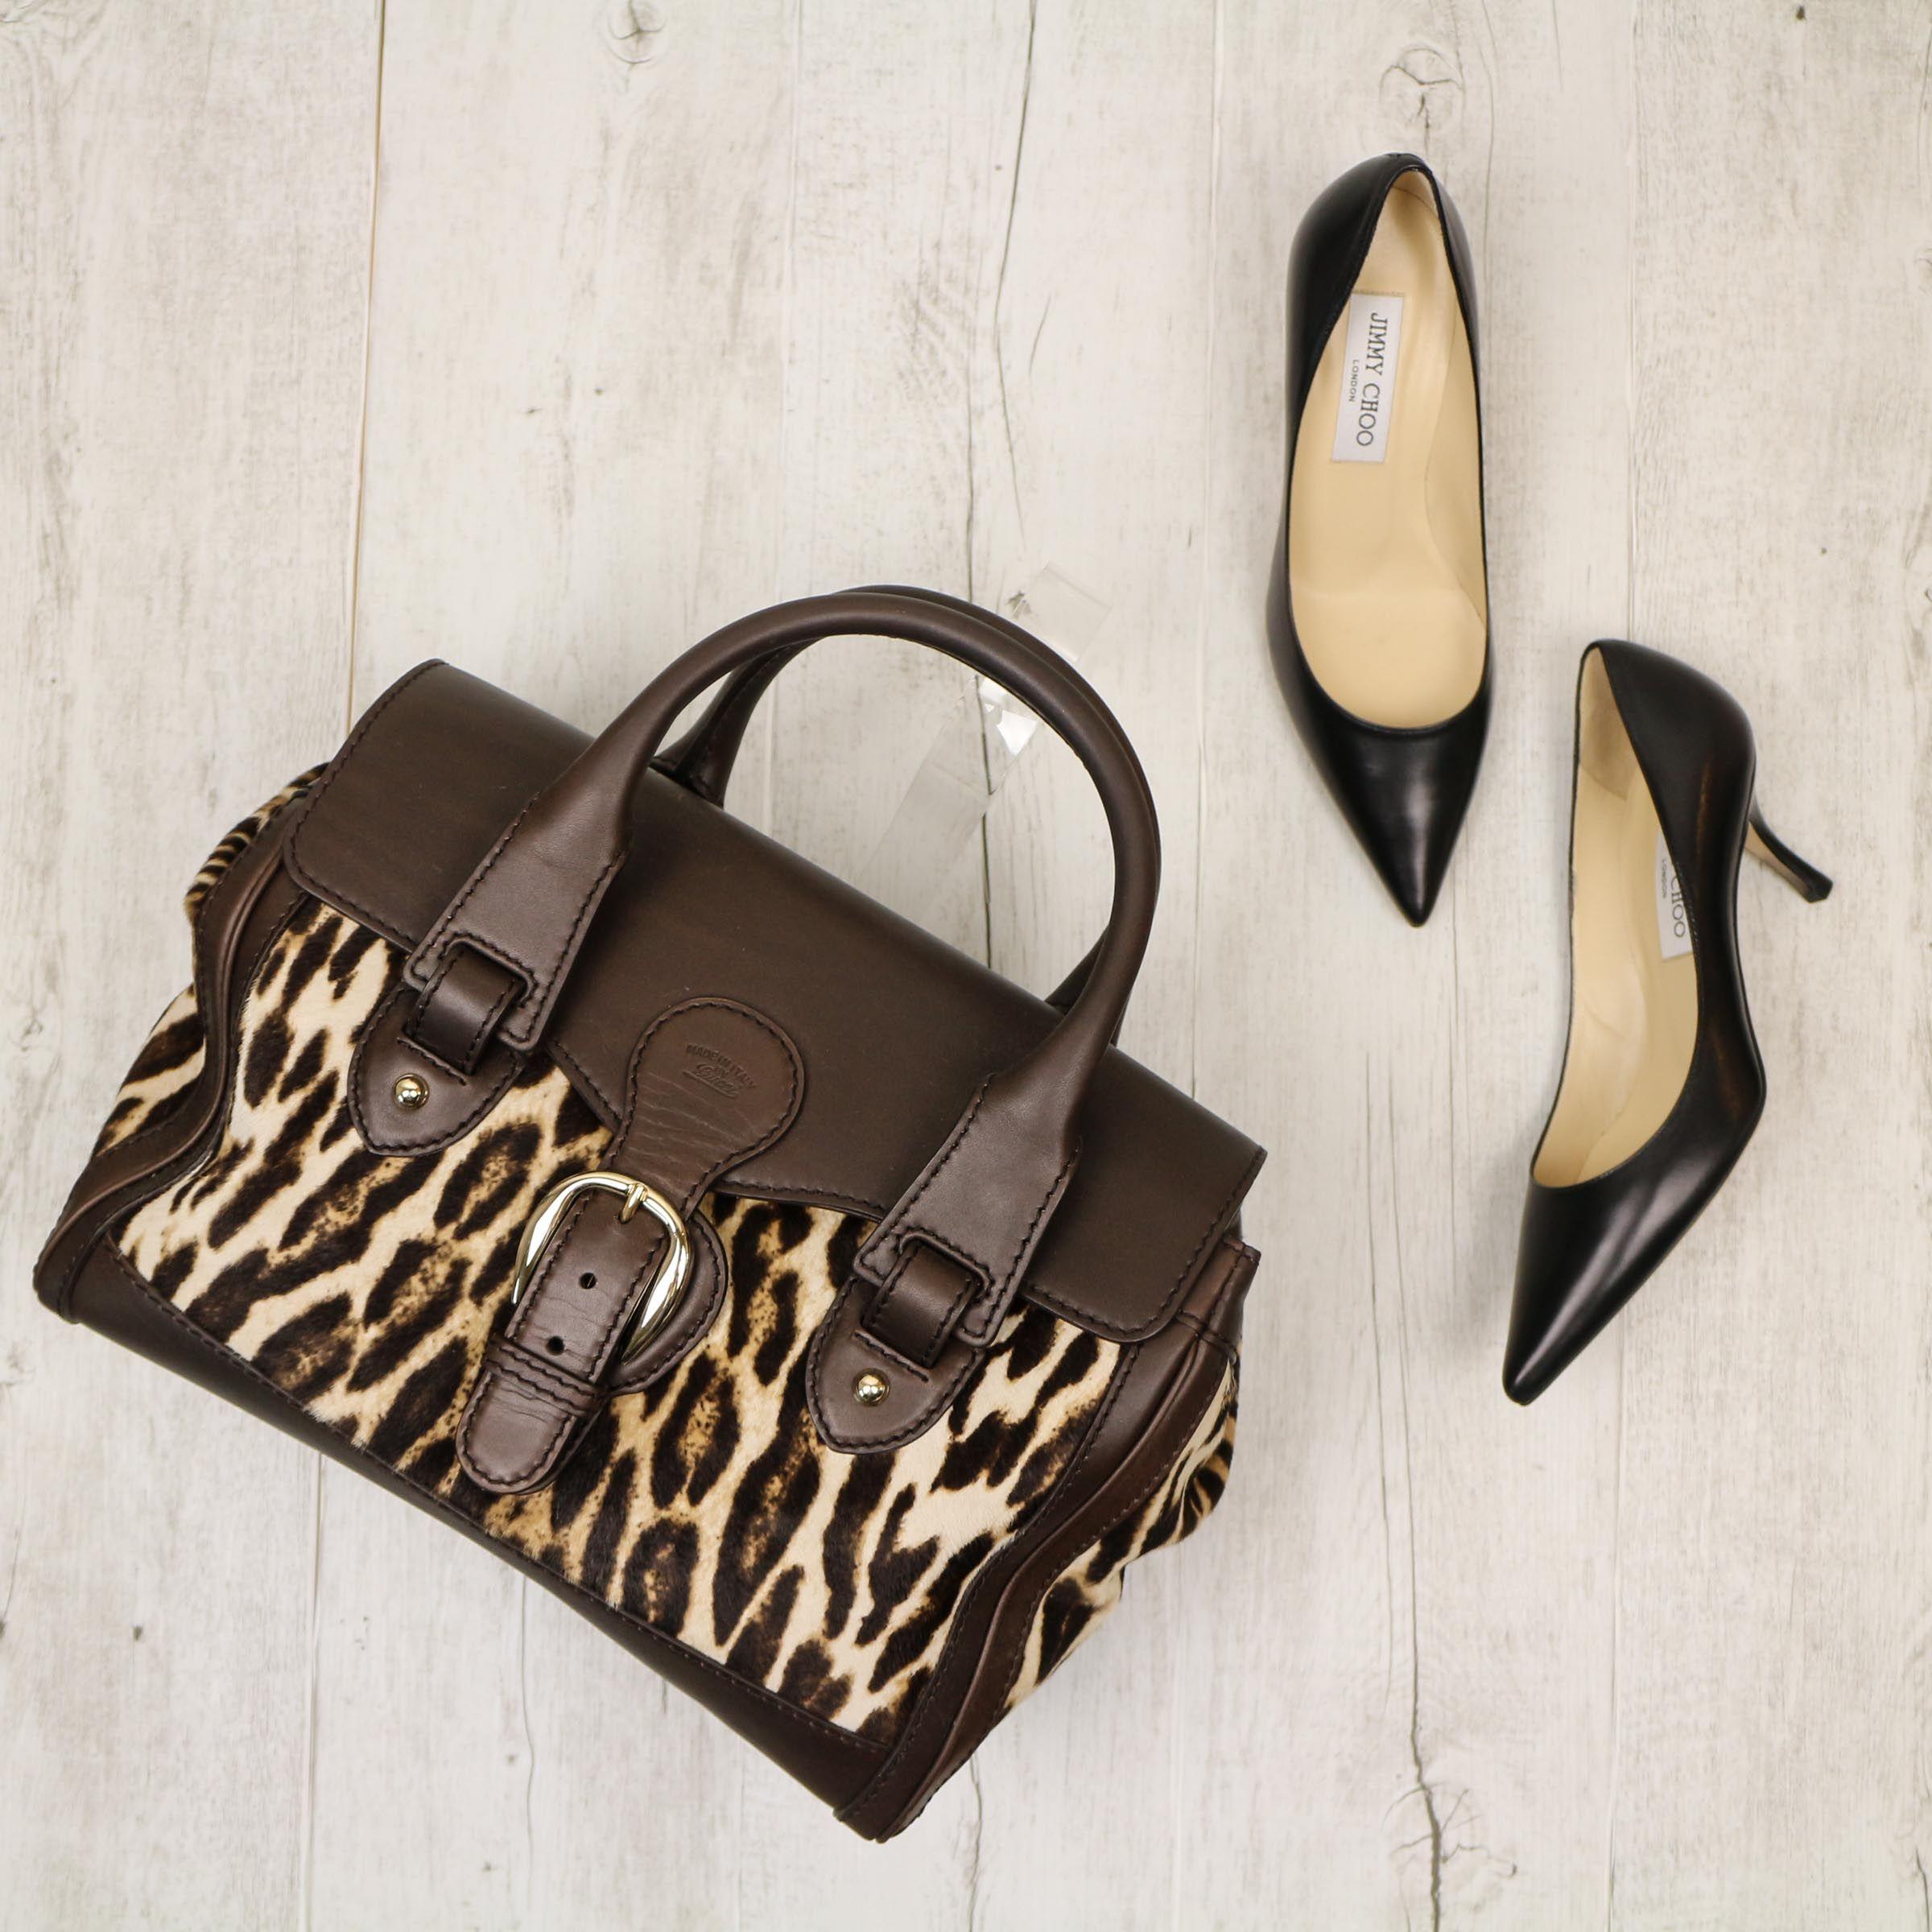 Gucci Medium Heritage Boston Leopard Print Pony Hair Handbag Price 1 800 00 Was 3 250 00 Condition Like New Size 1 Pc Gucci Bag Lady Dior Bag Pony Hair